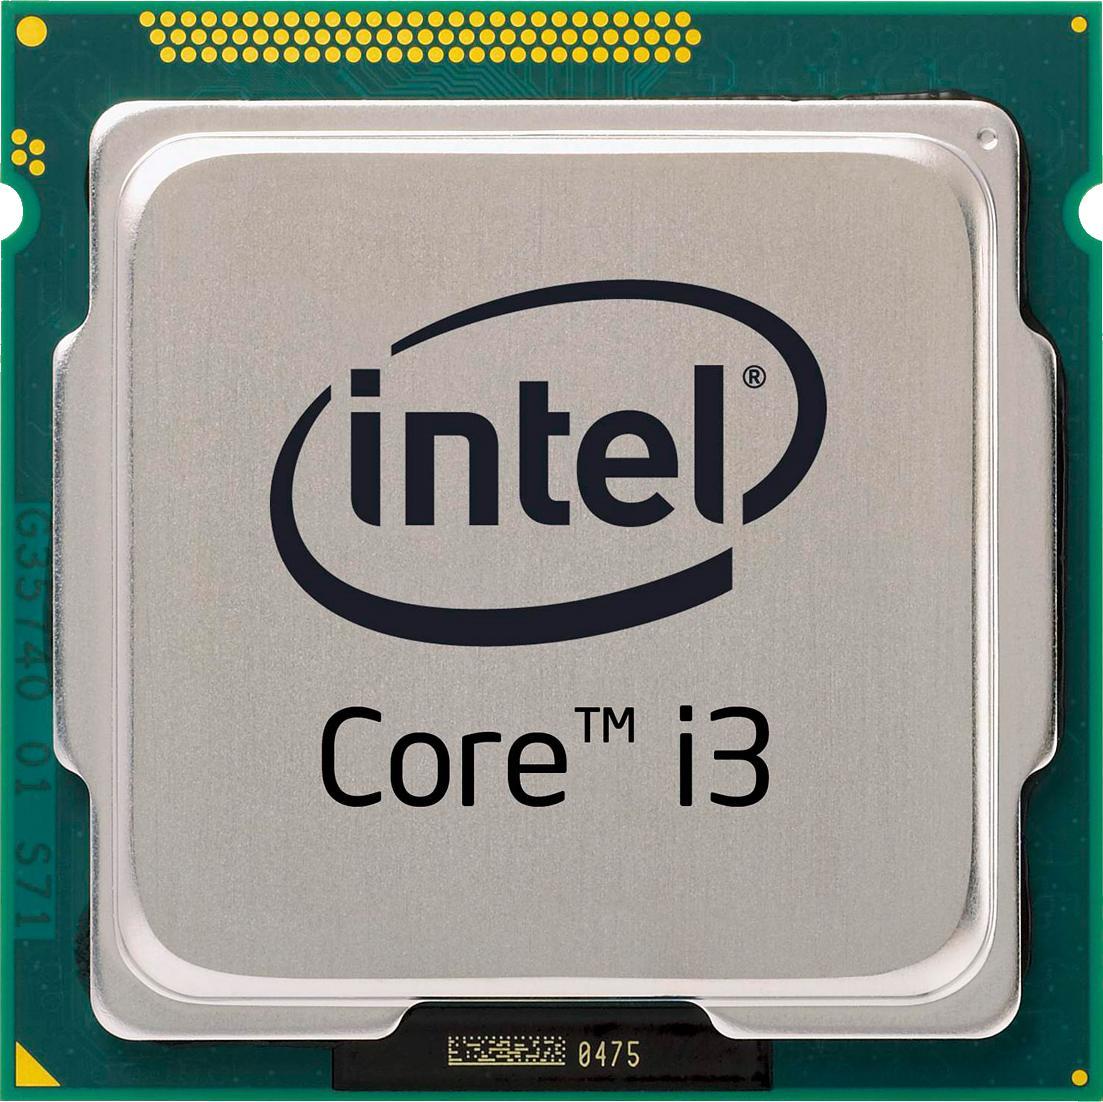 Intel Core i3-2375M